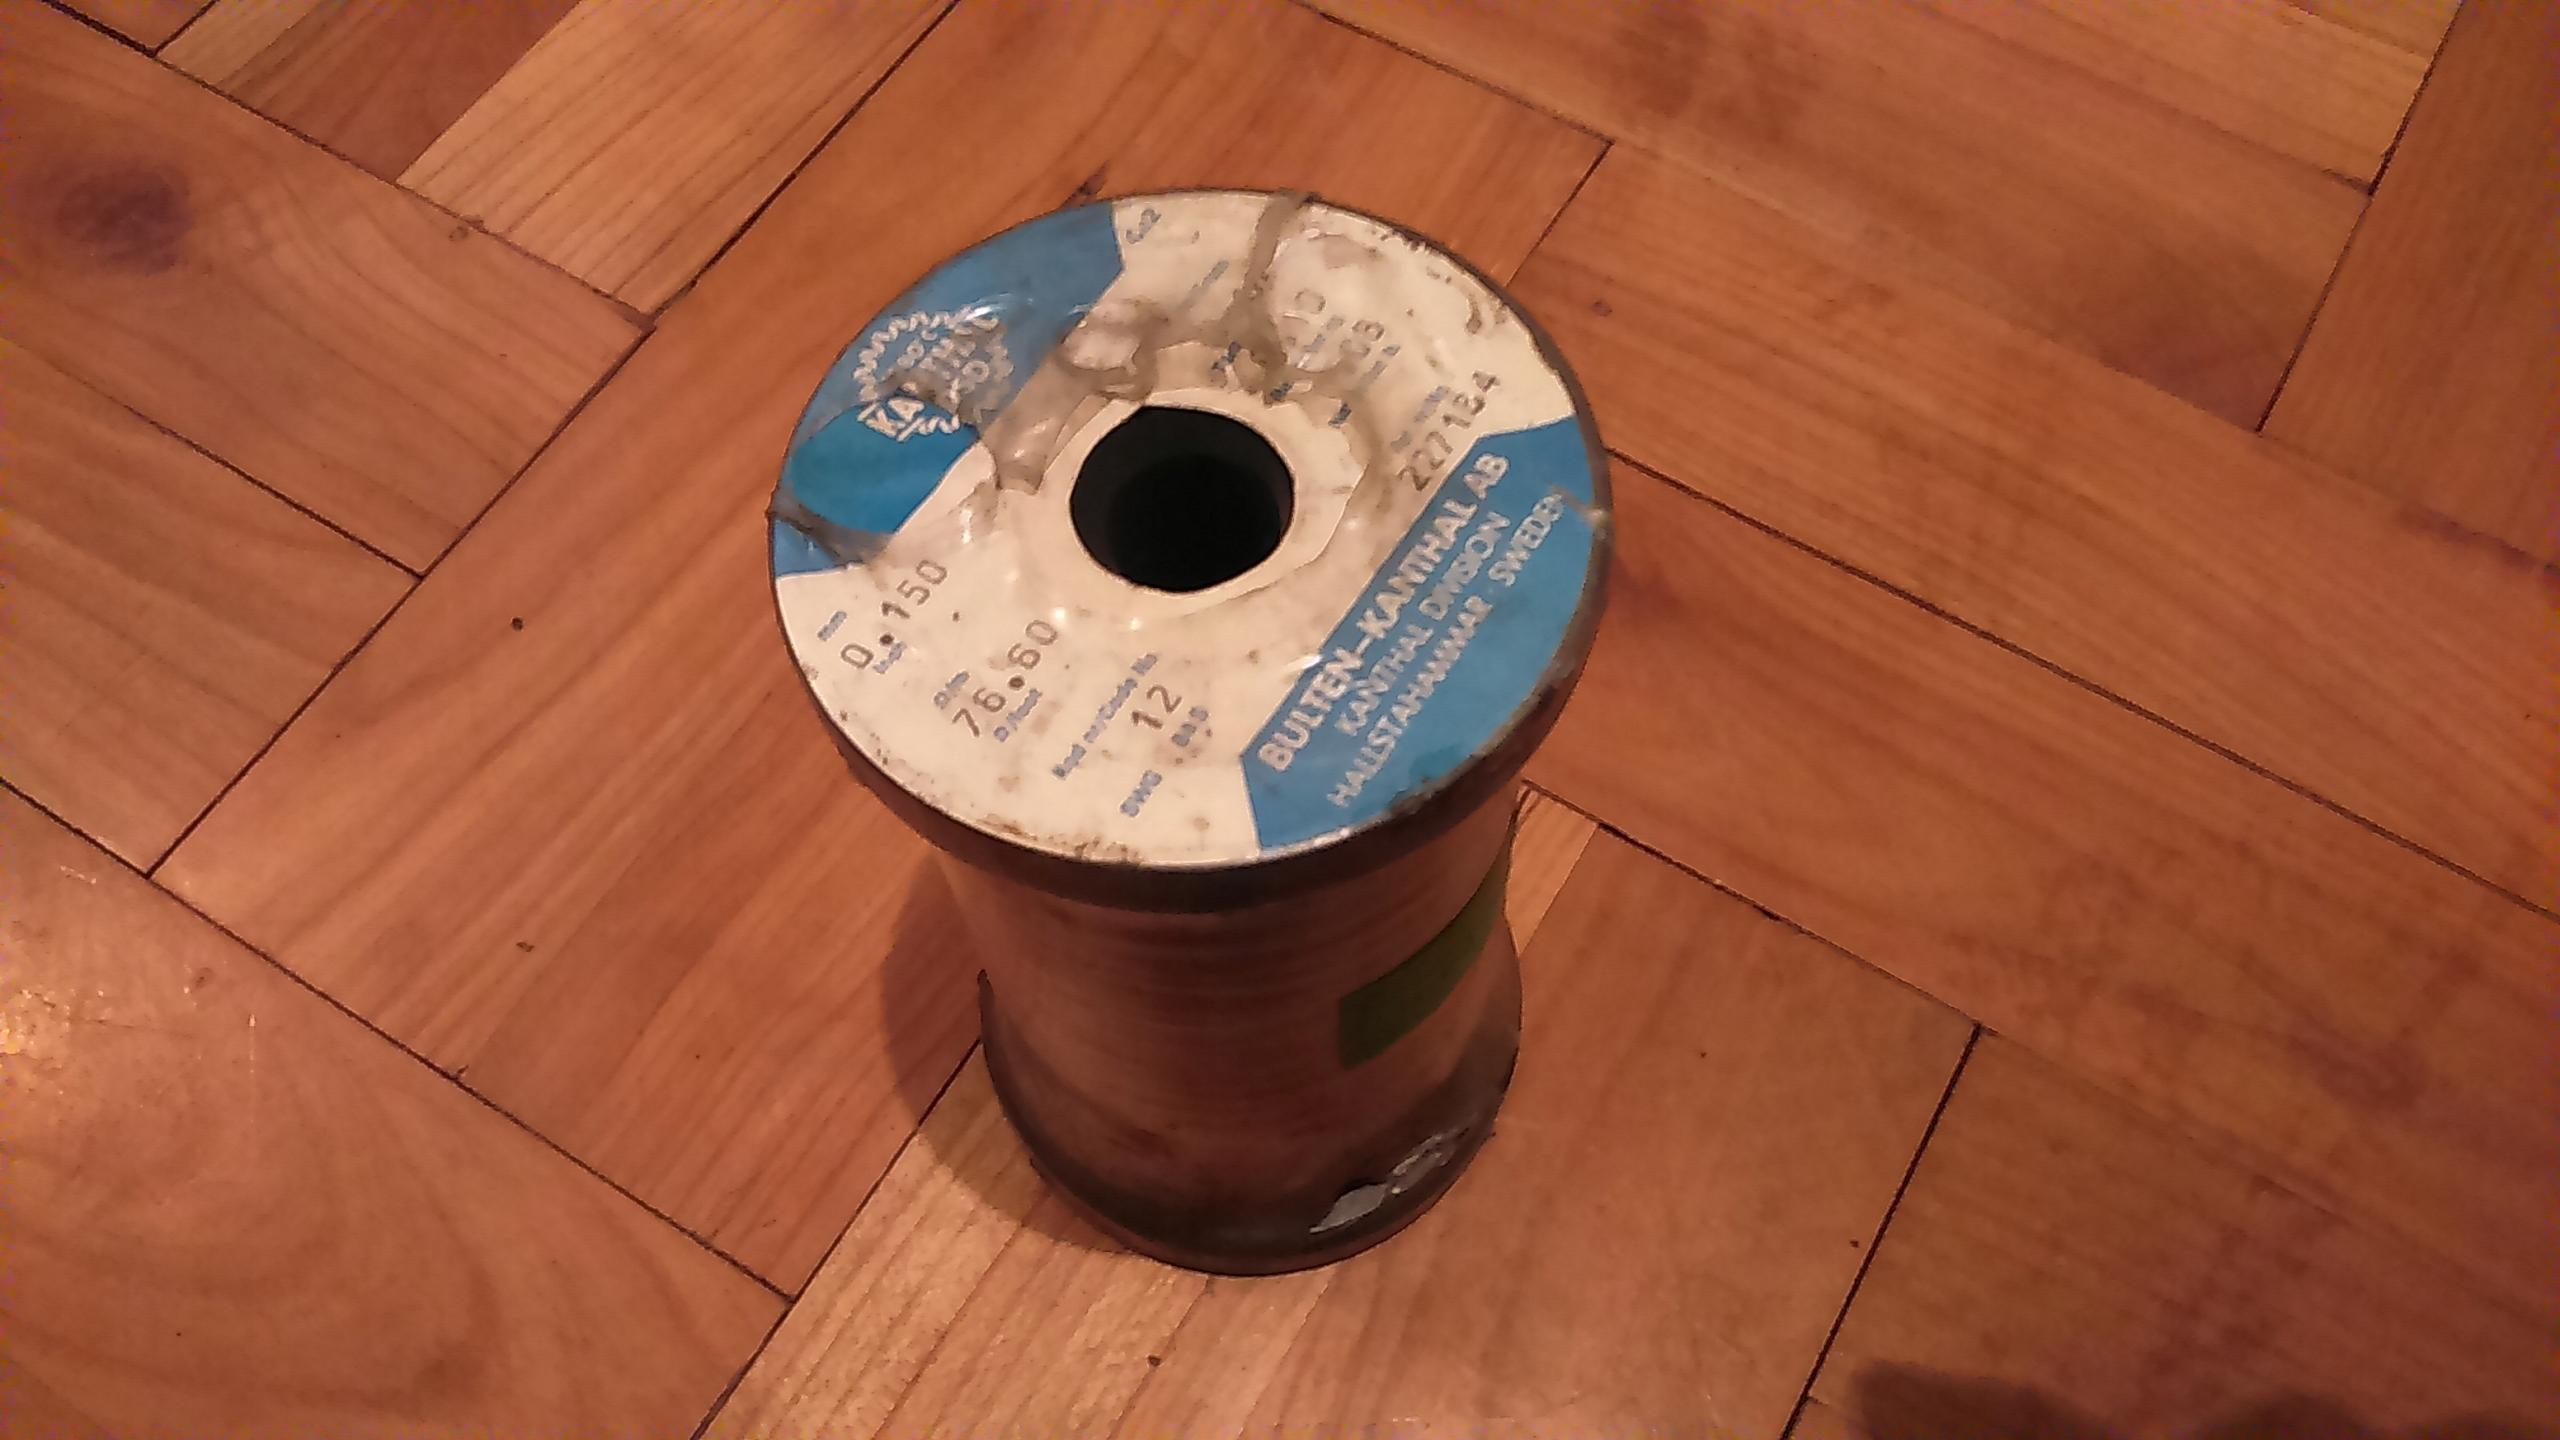 drut kanthal średnica 0,15 cała szpula waga 1kg